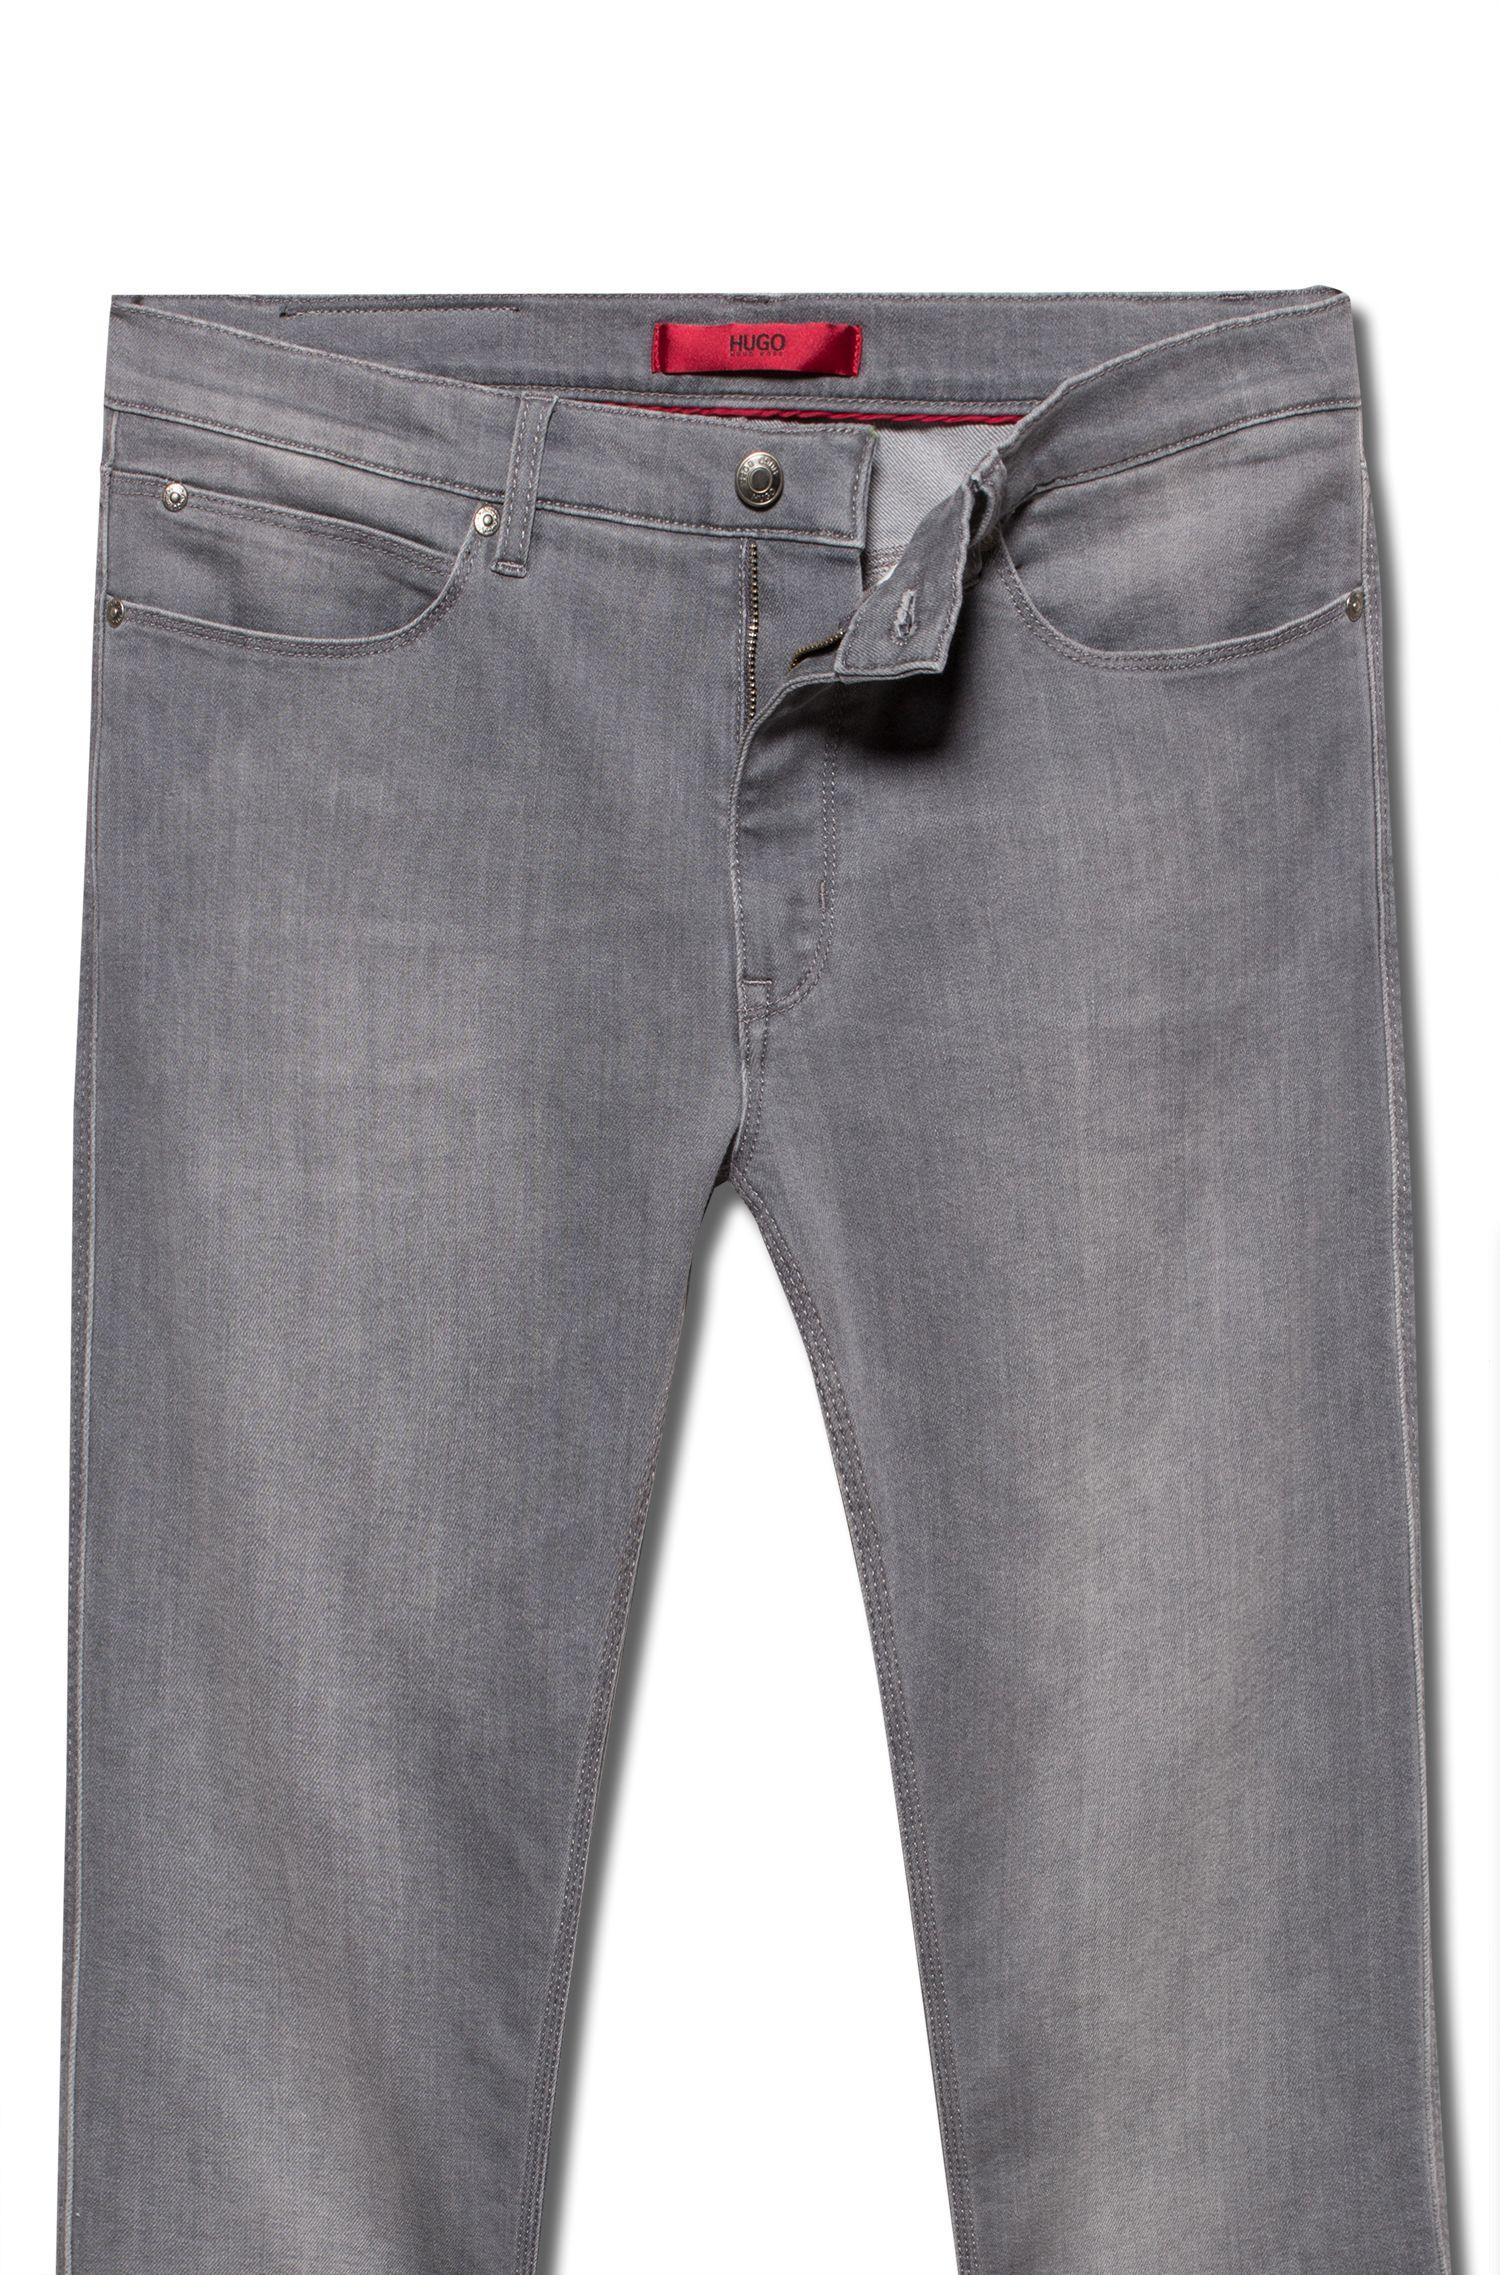 Skinny-fit jeans in lightweight stretch denim, Grey